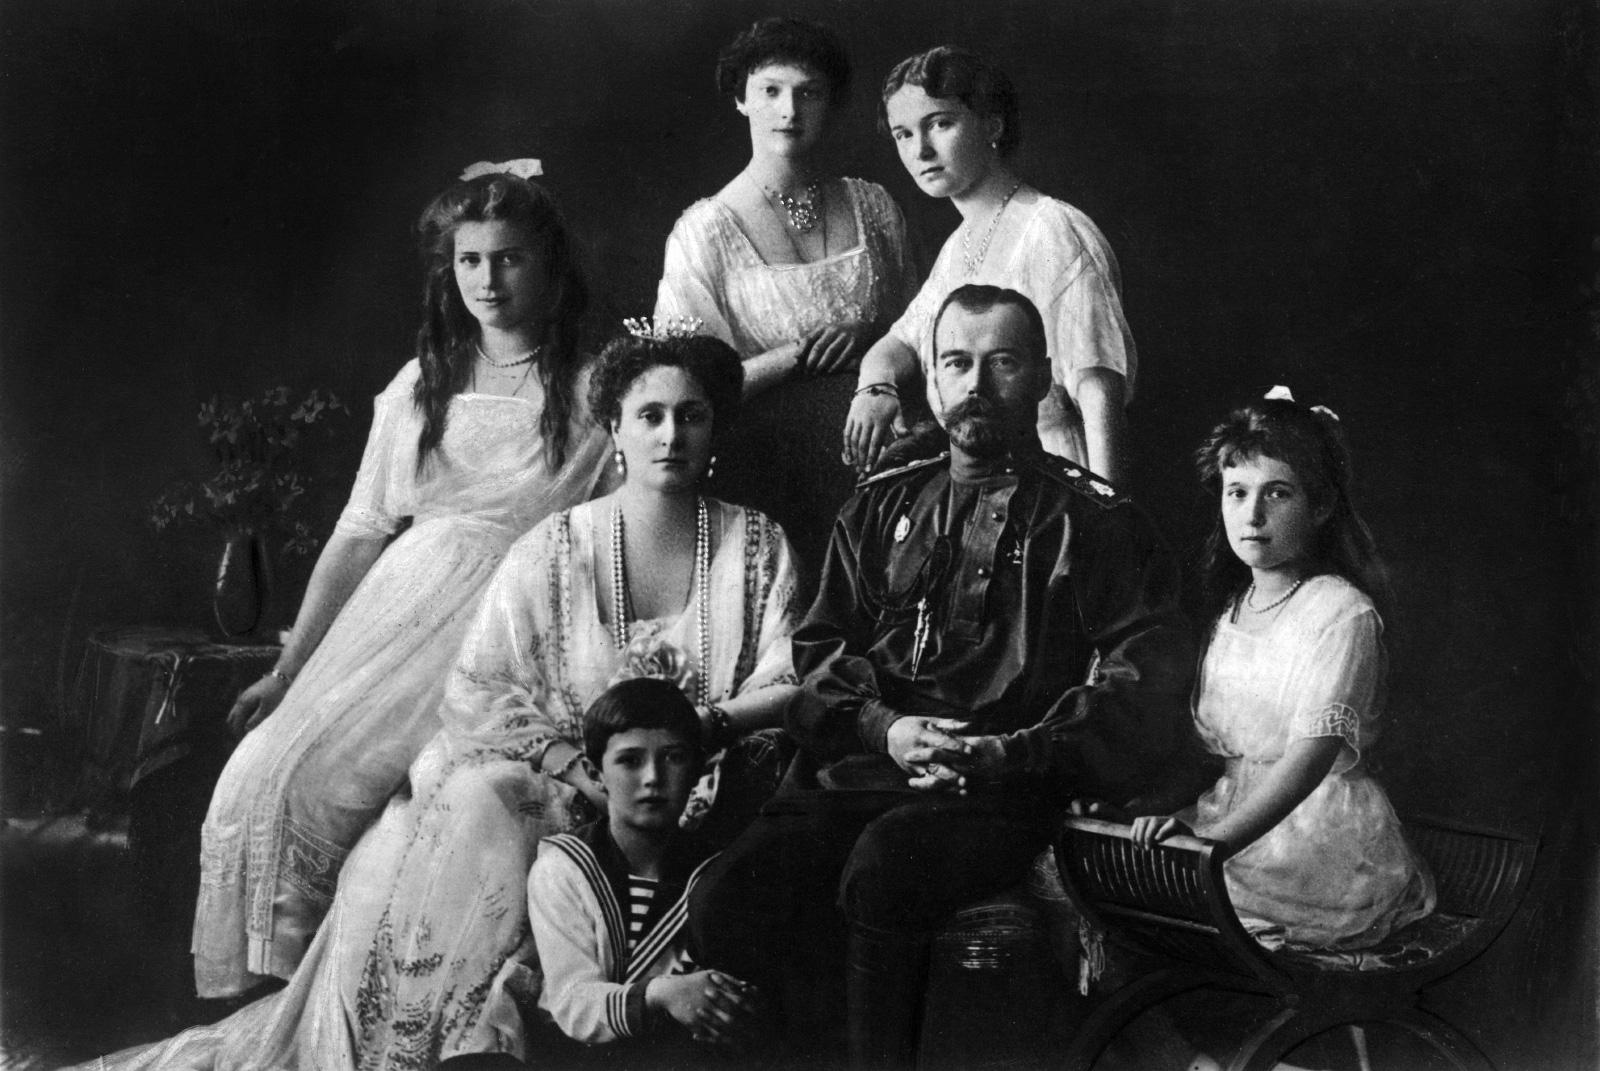 Tsar Nicholas II of Russia with his wife, Alexandra of Hesse-Darmstadt, and her daughters, Ol'ga, Tat'jana, Marjia e Anastasia and Aleksej. 1913 (Mondadori Portfolio/Getty Images)